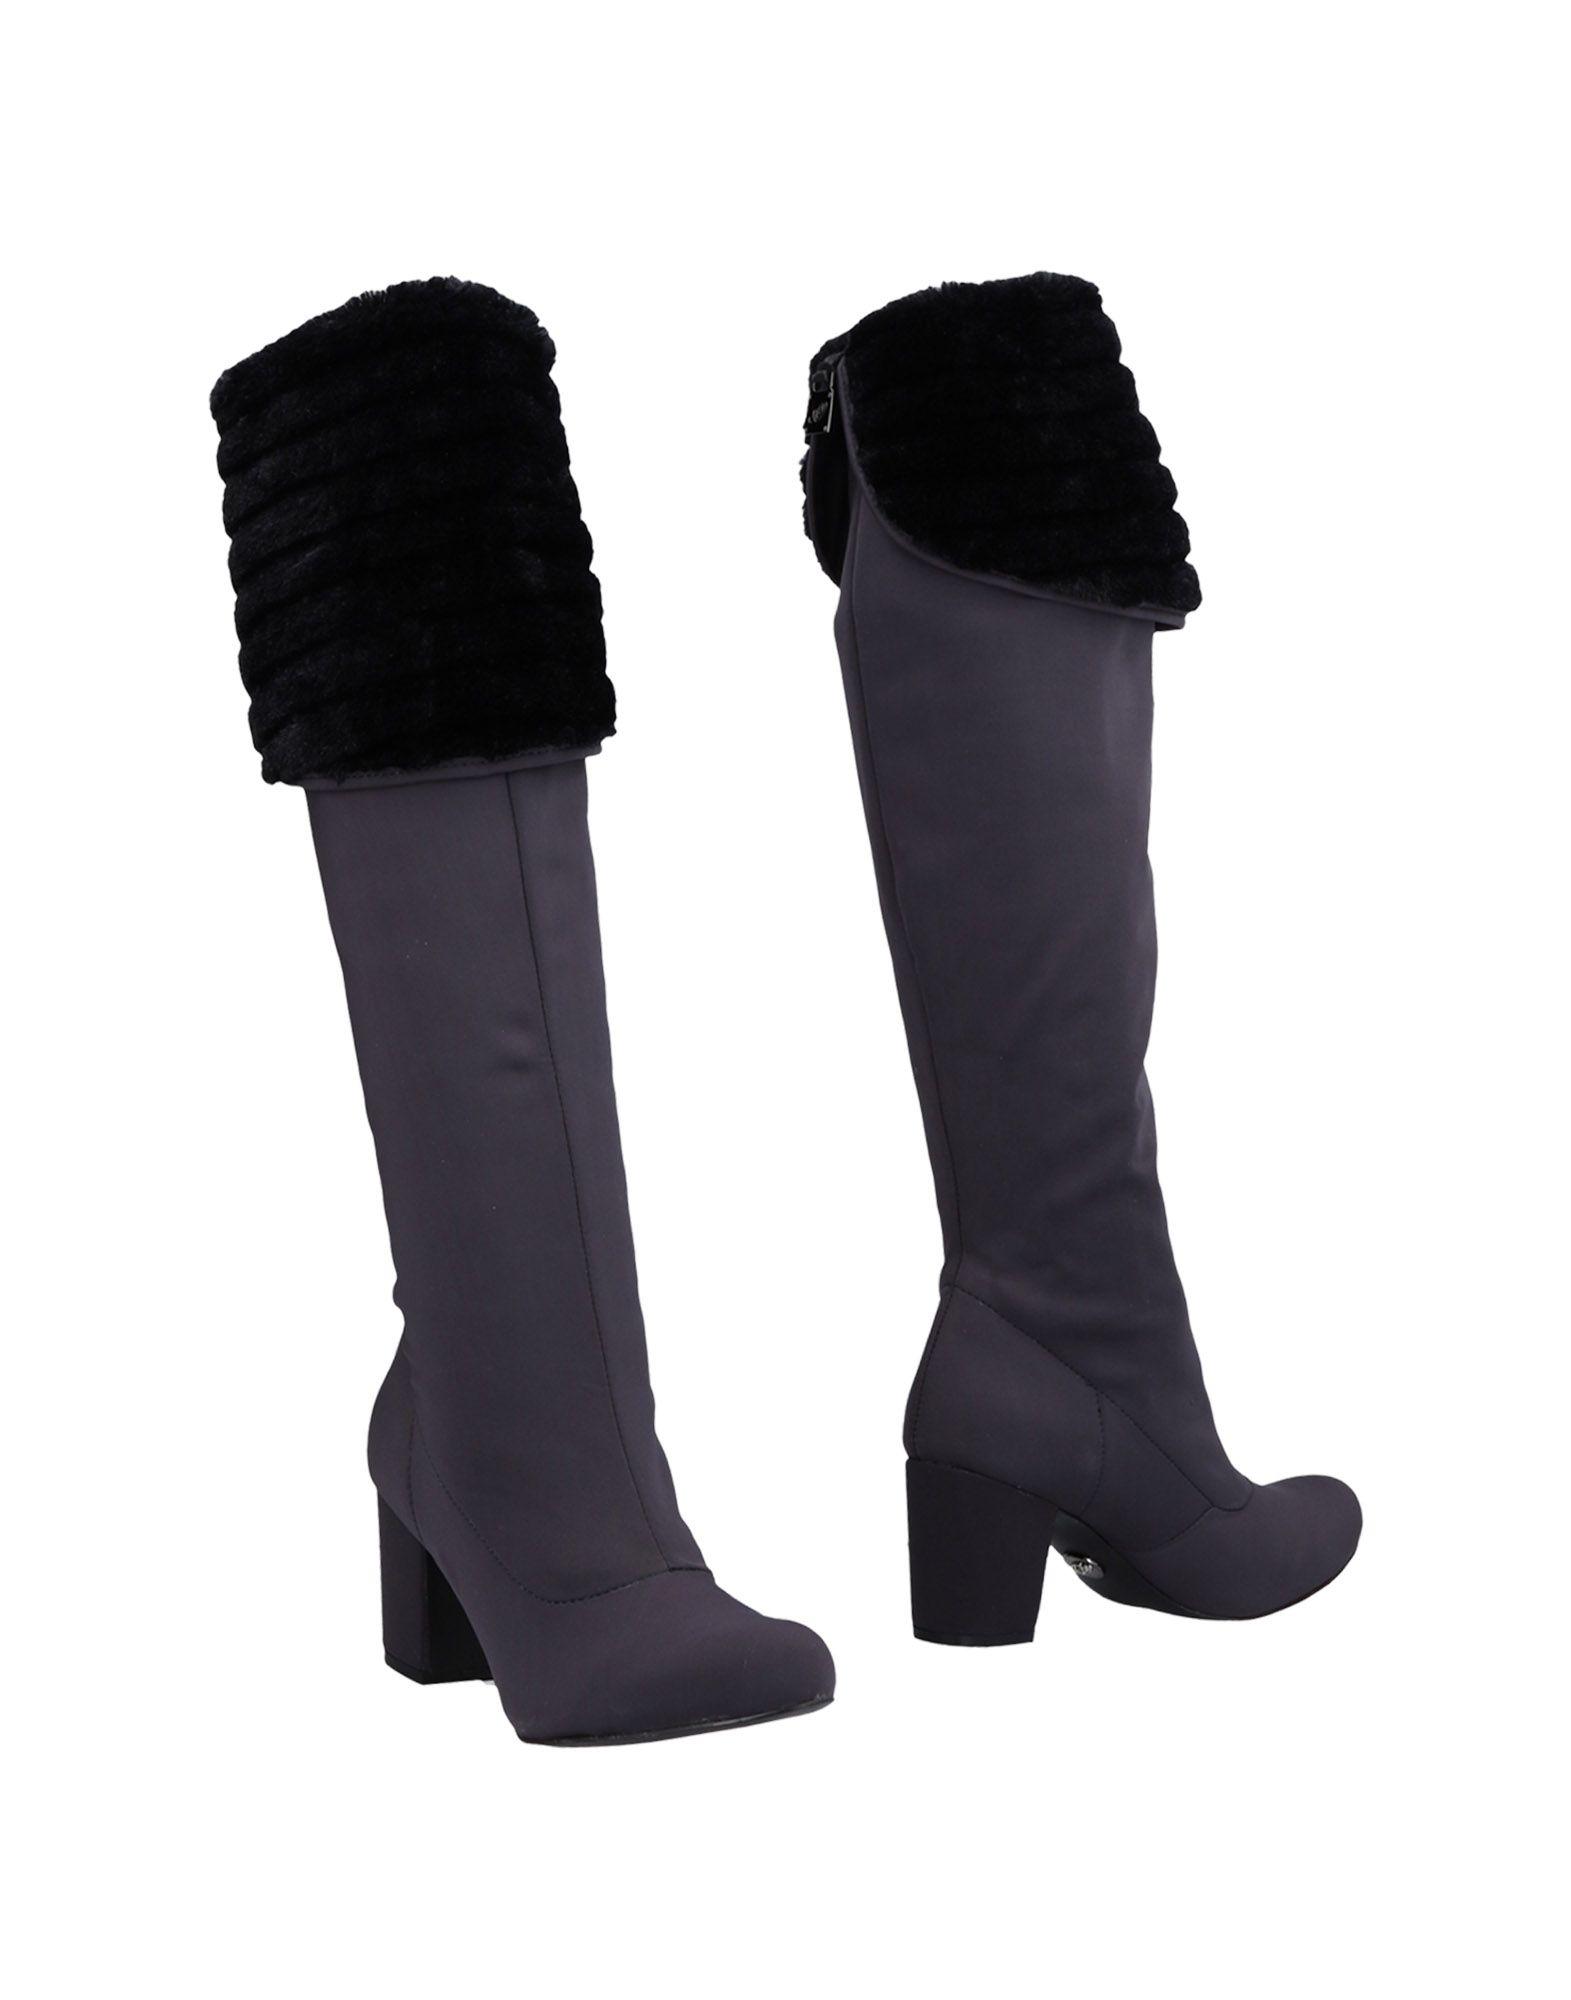 Stilvolle billige Stiefel Schuhe Alberto Venturini Stiefel billige Damen  11467896DC 1e4ead